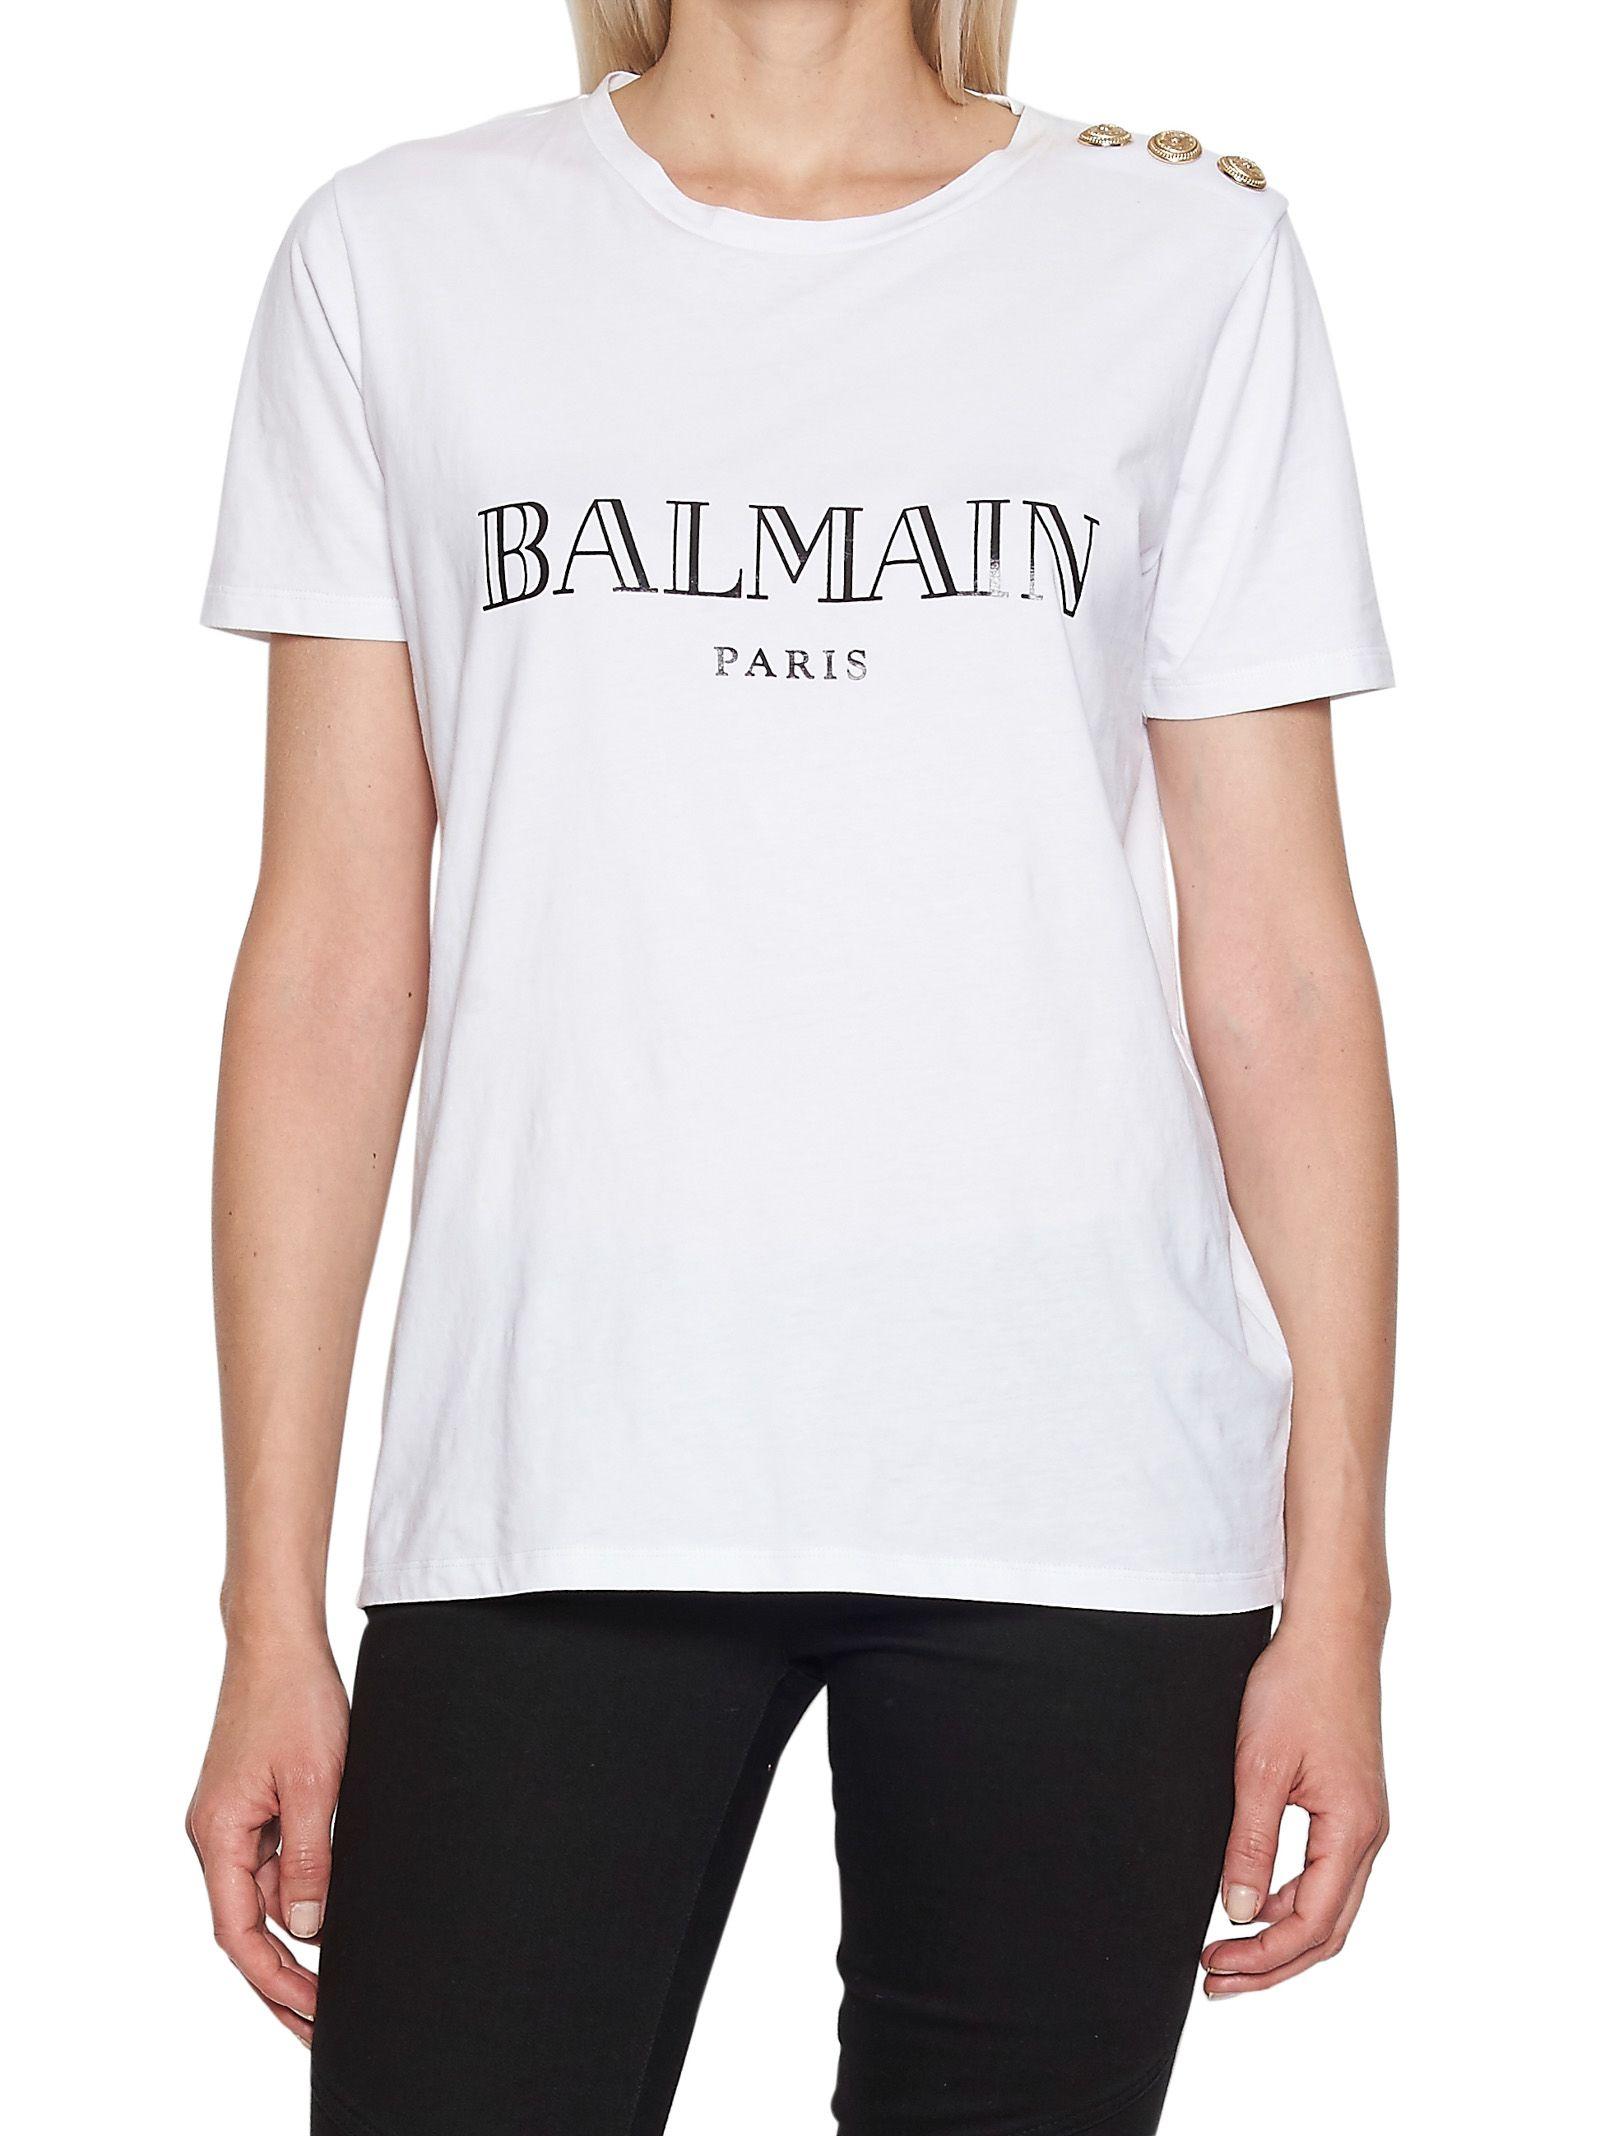 Balmain logo printed cotton jersey t shirt white modesens for Balmain white logo t shirt